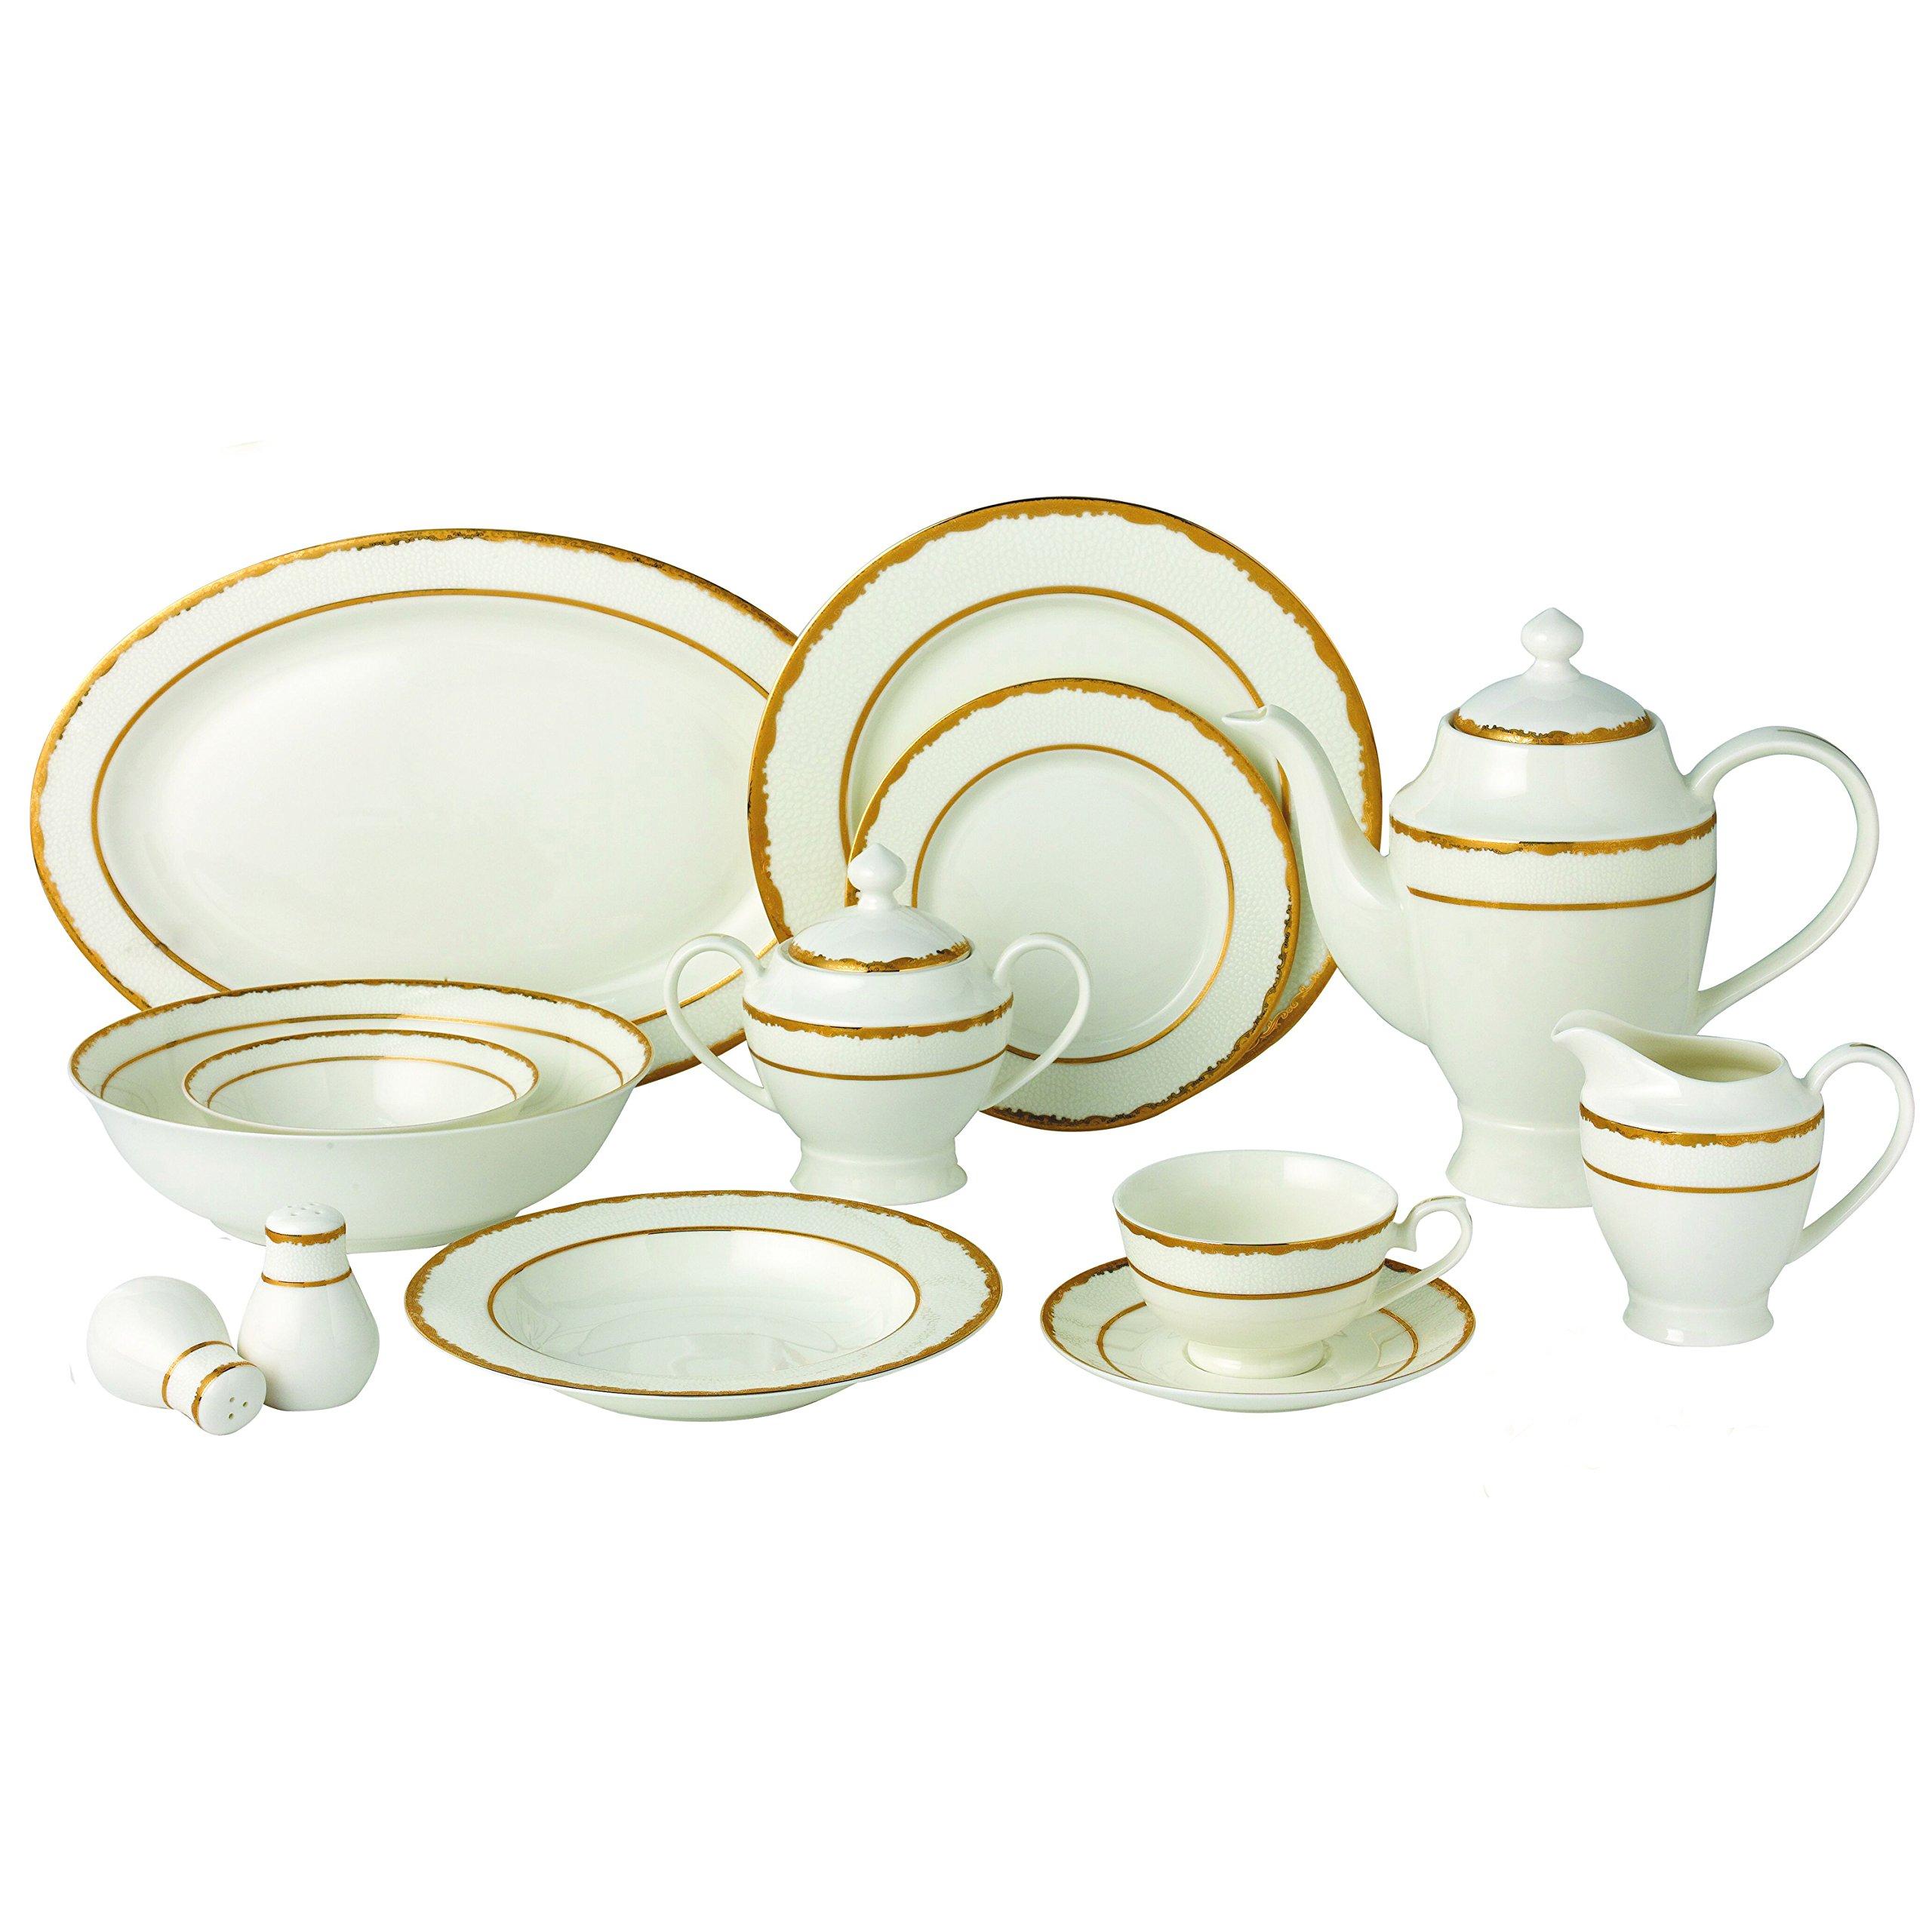 Lorren Home Trends Sonia-57 57 Piece Sonia Collection Dinnerware Set, Gold